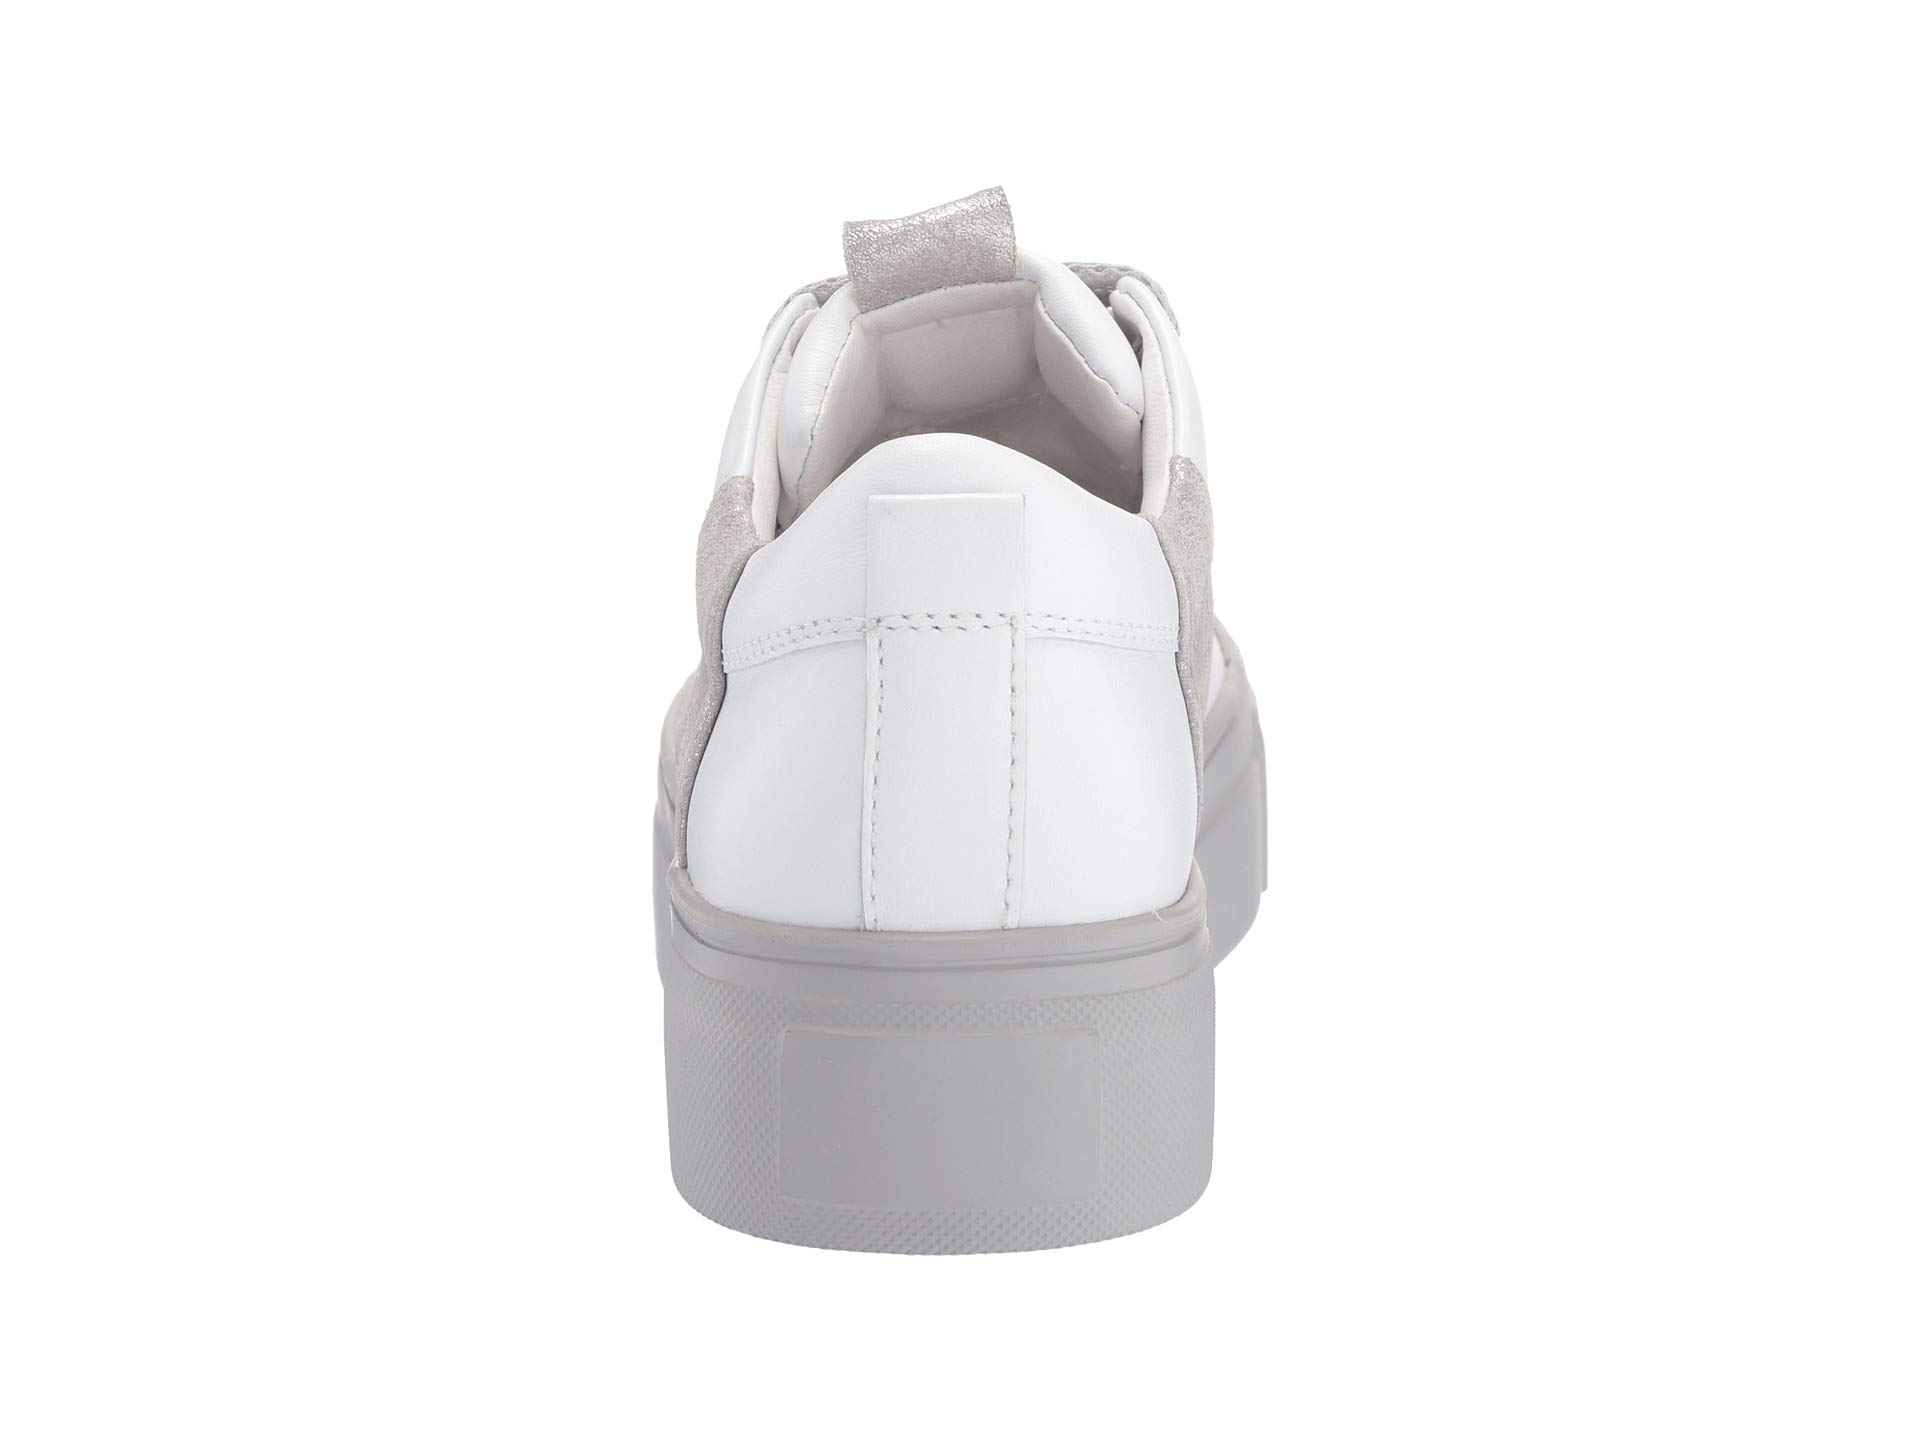 Kennel Schmenger Bianco Striped Big silver amp; Sneaker Metallic Calf rrwvZ